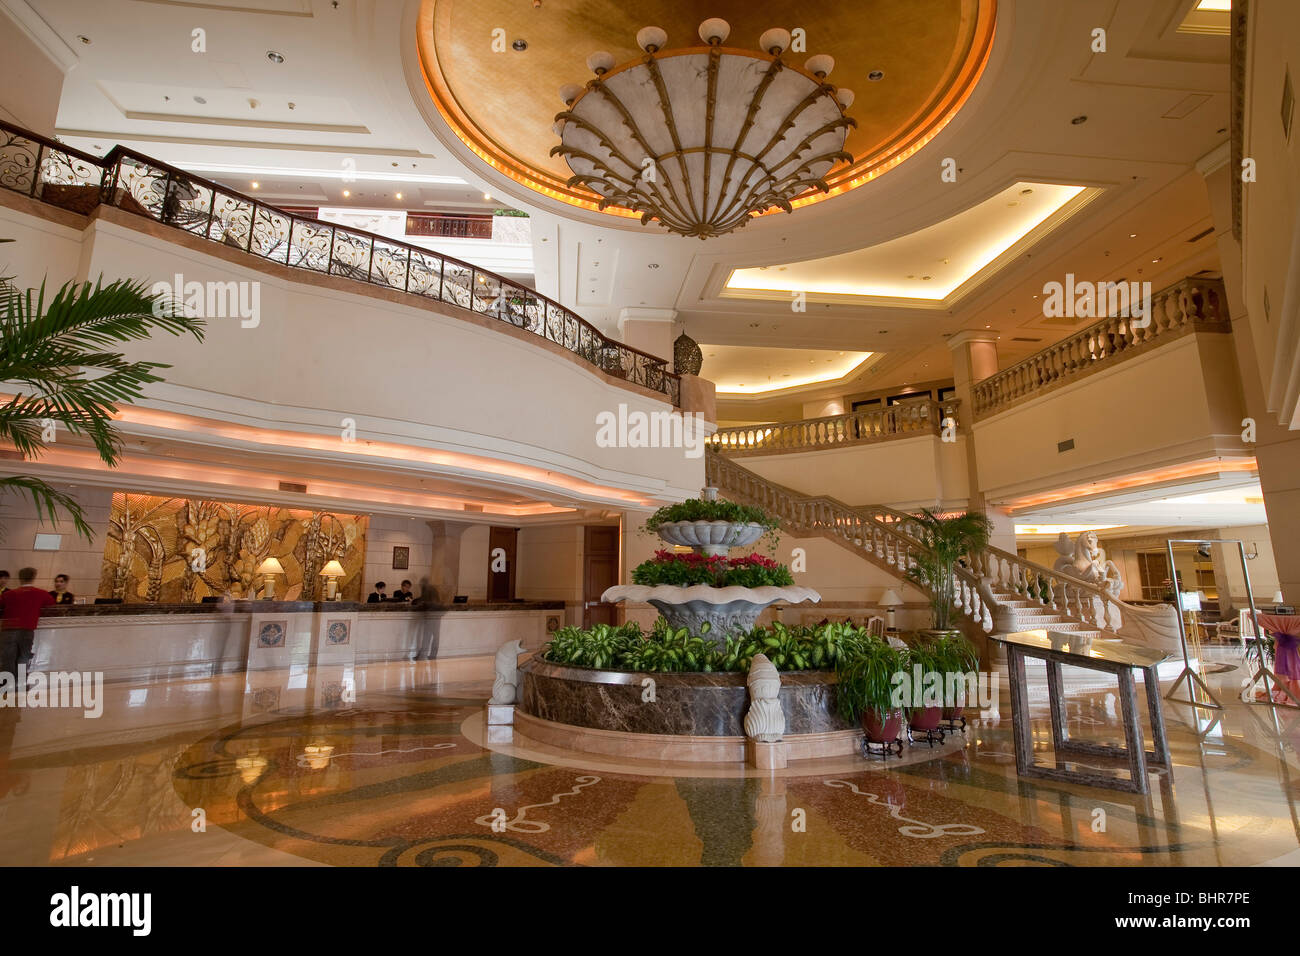 Hotel - Stock Image